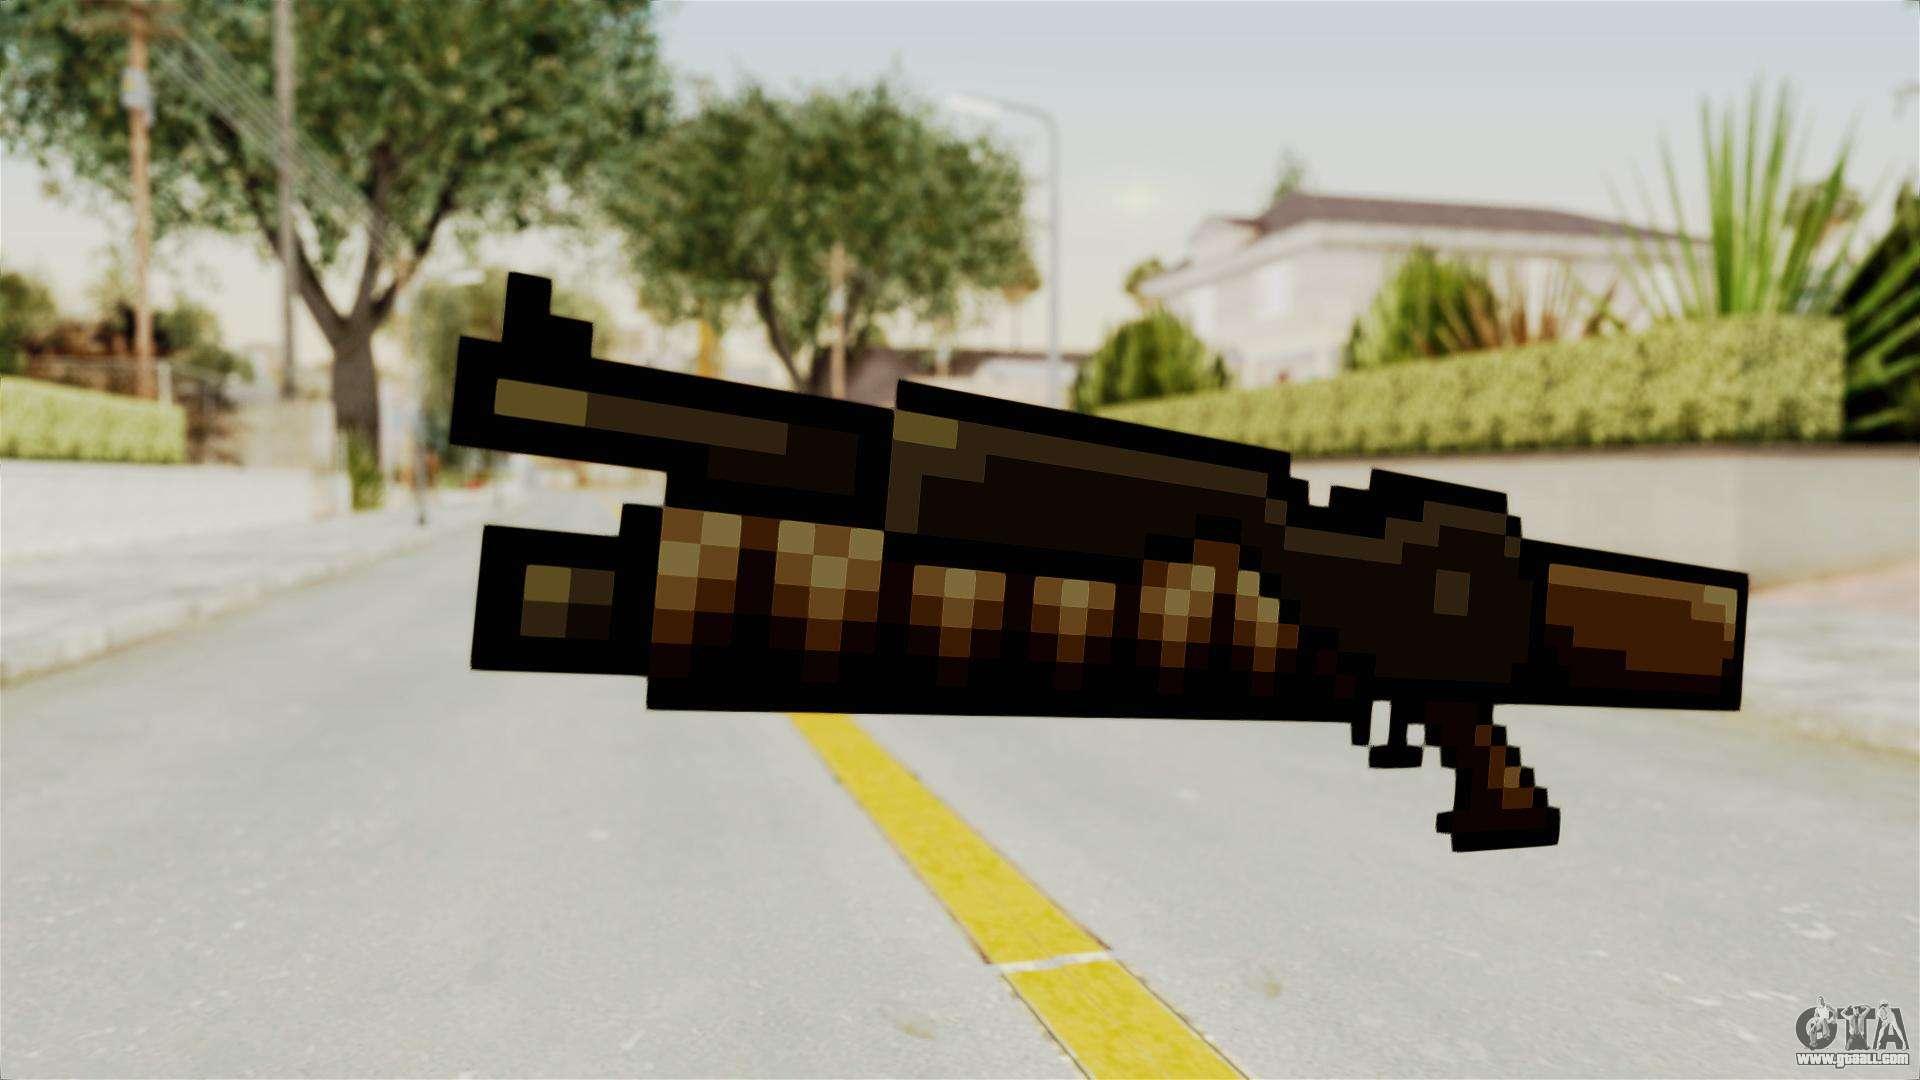 metal slug heavy machine gun